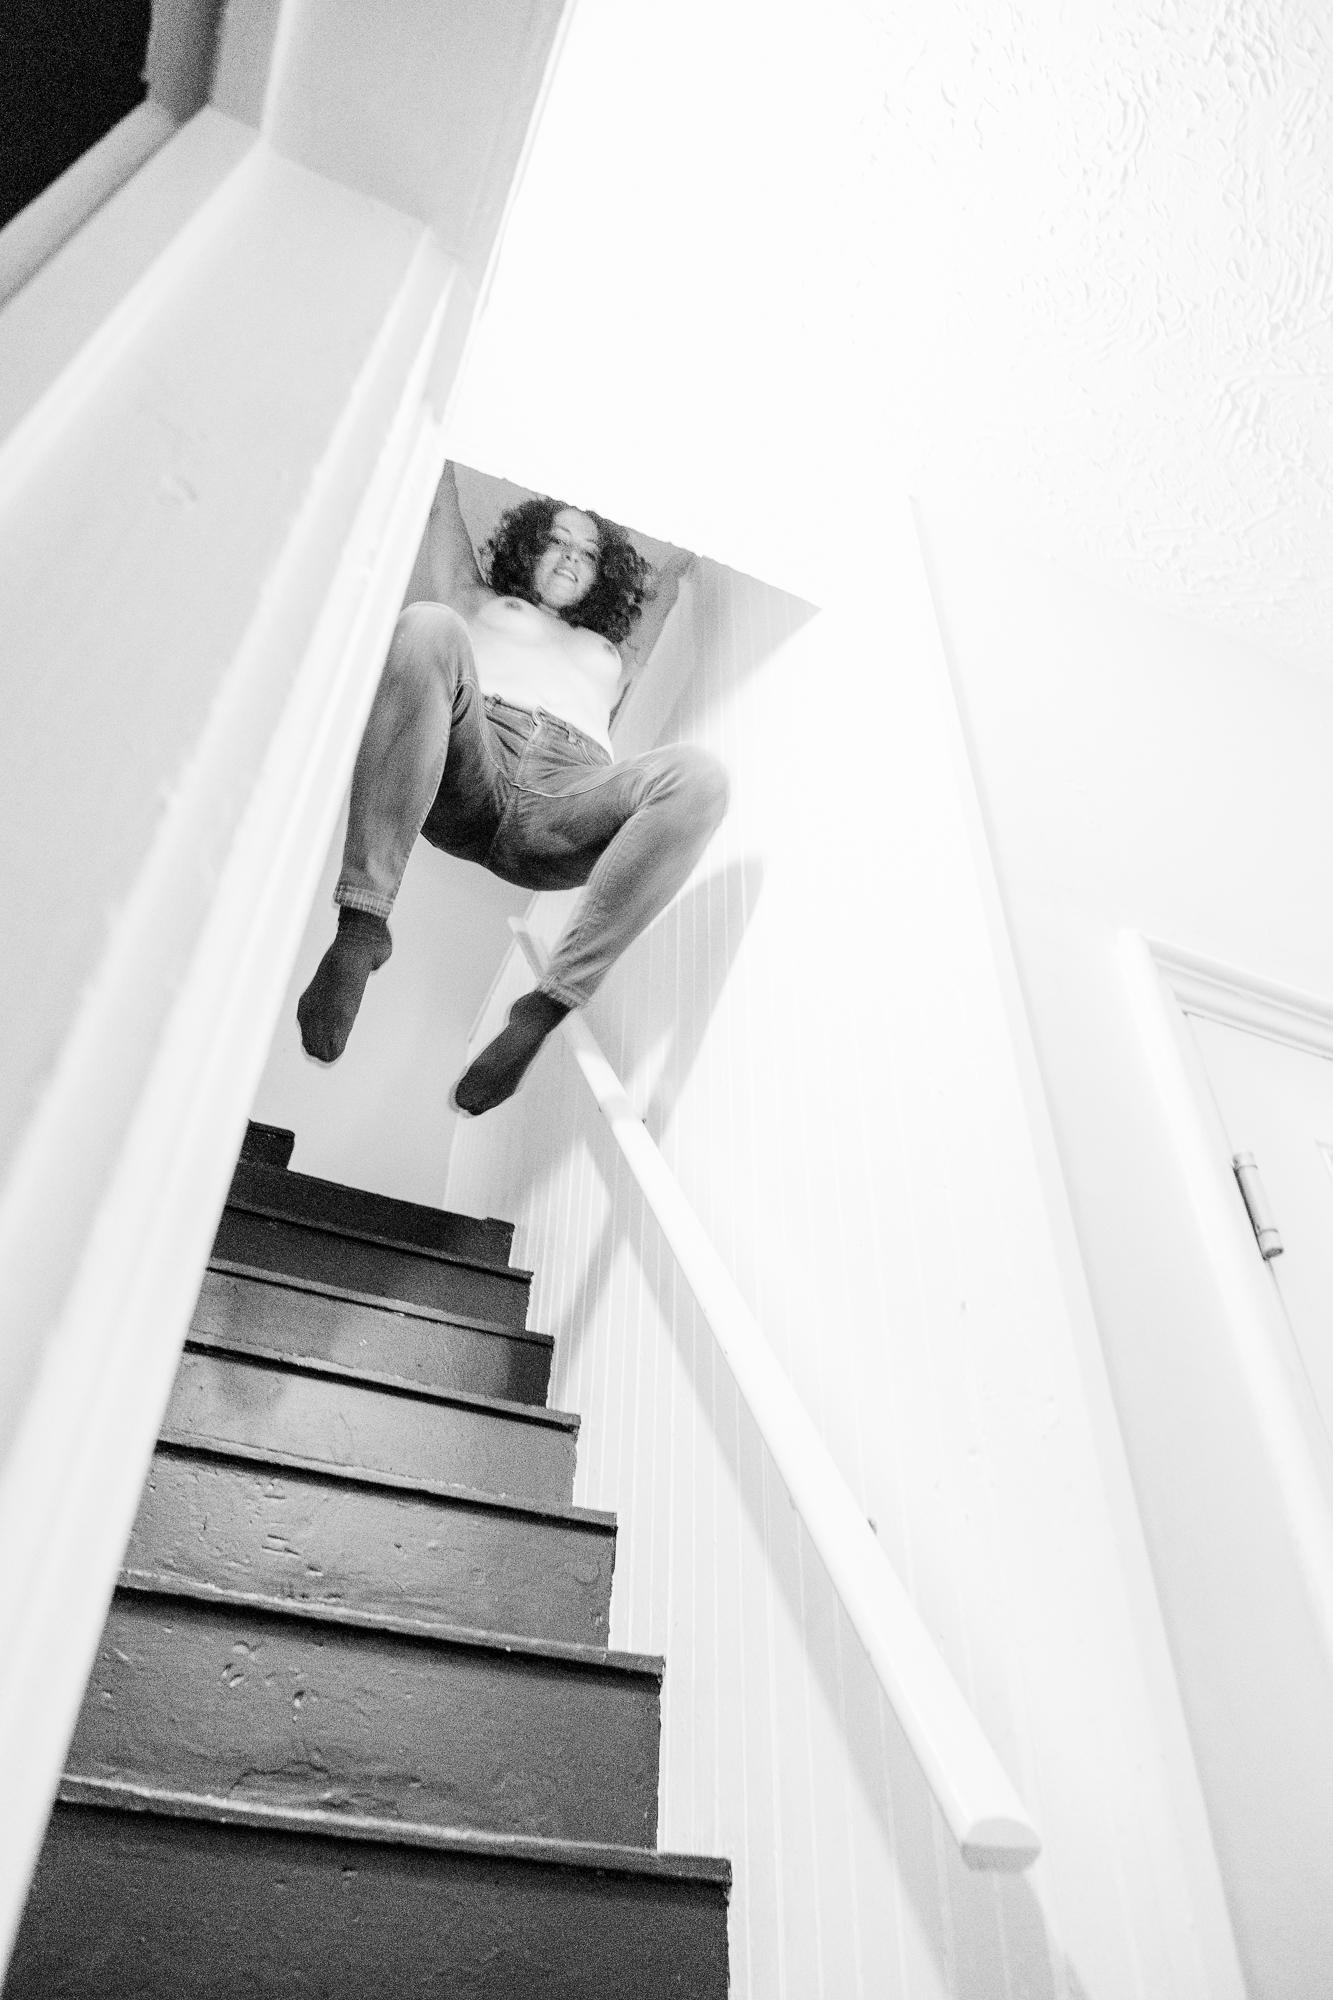 20181128-Brandi-Hannah-apartment-X-T2-0065-Edit.jpg